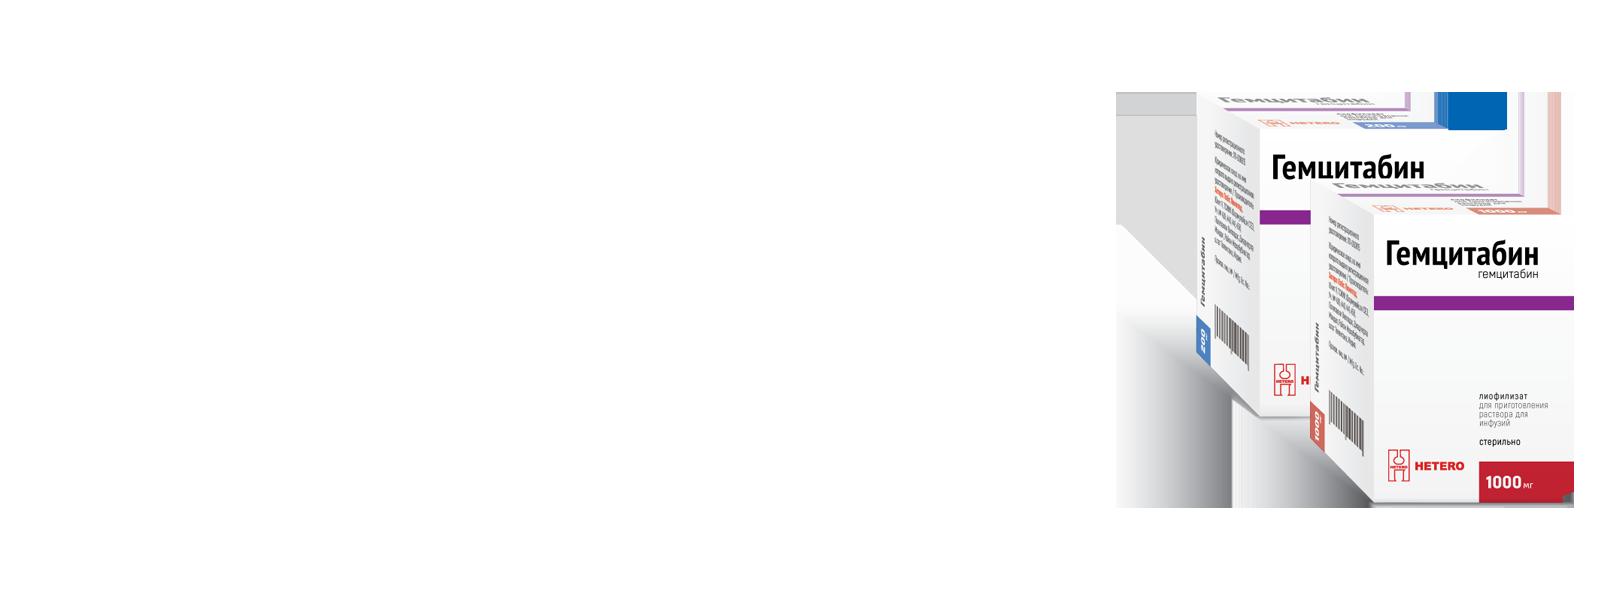 5279 ГЕМТЕРО - Gemcitabine